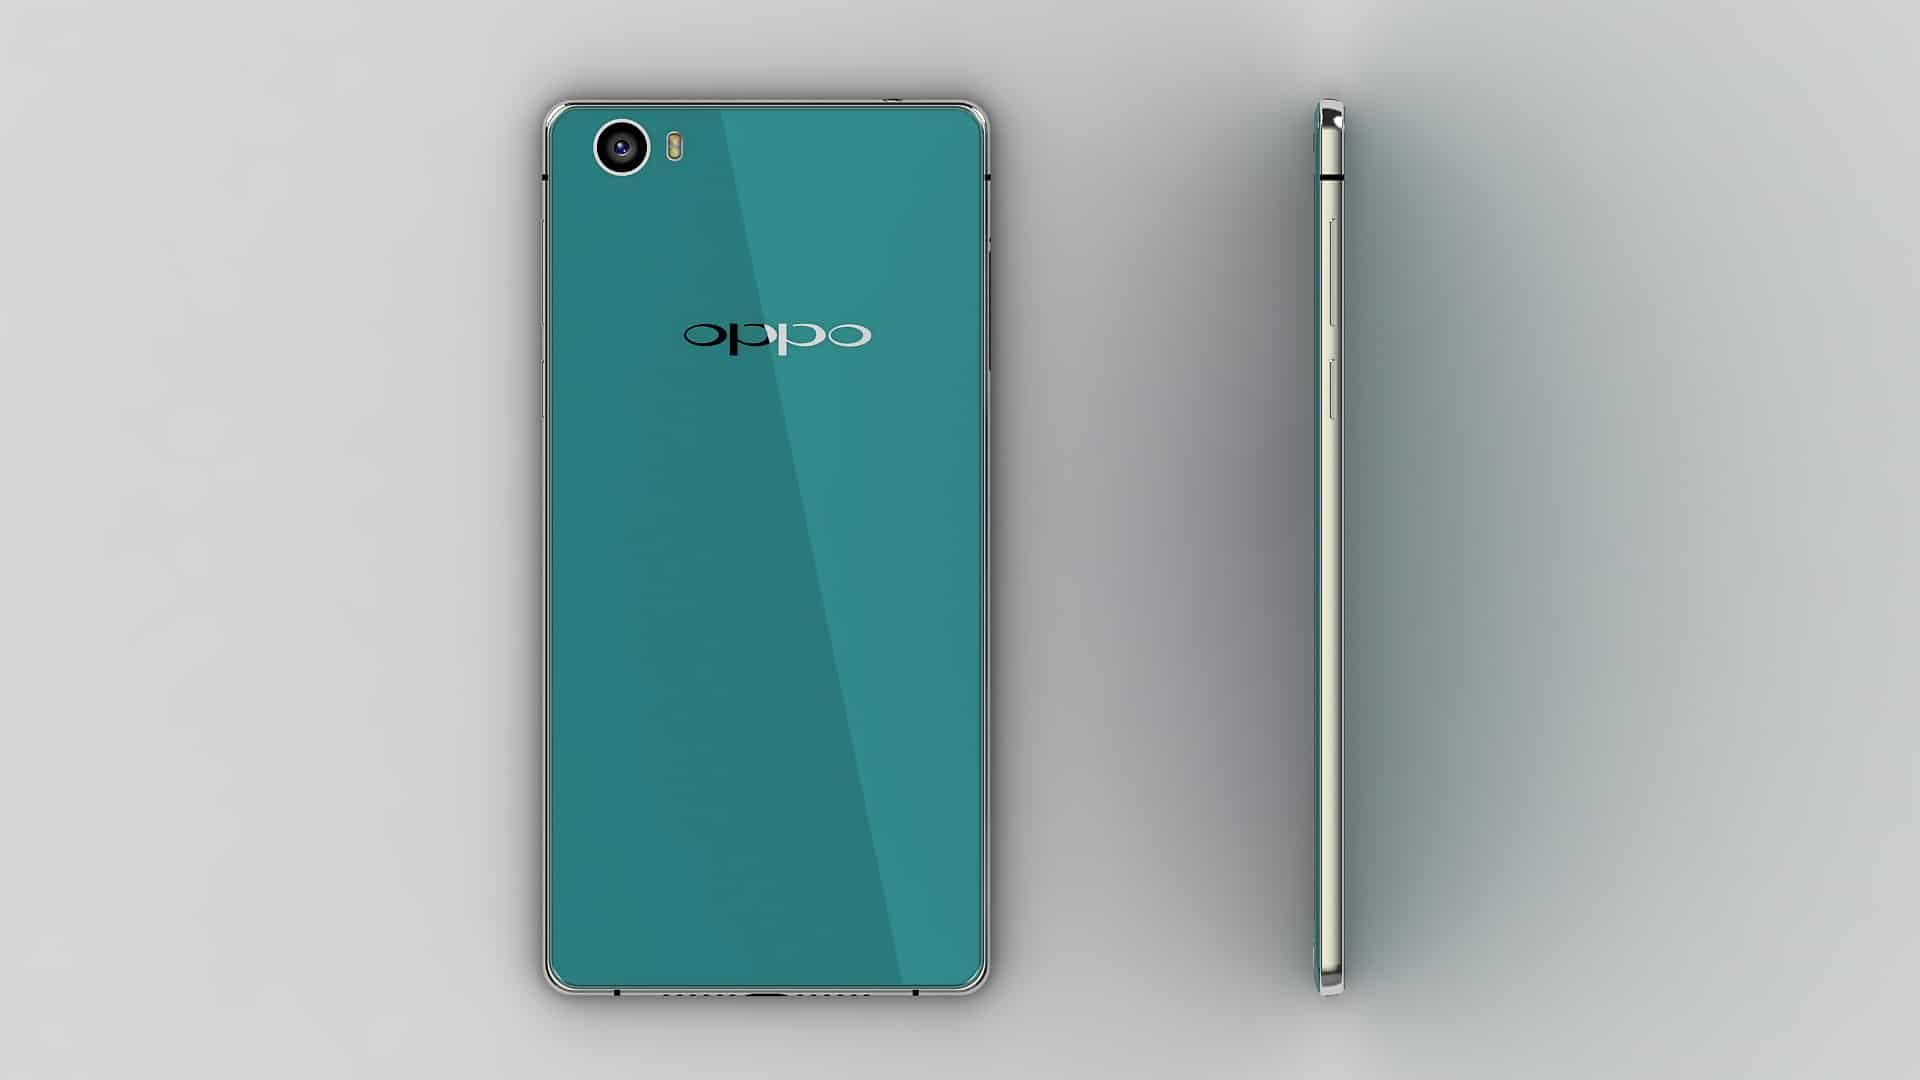 Oppo R7 pre launch render 1